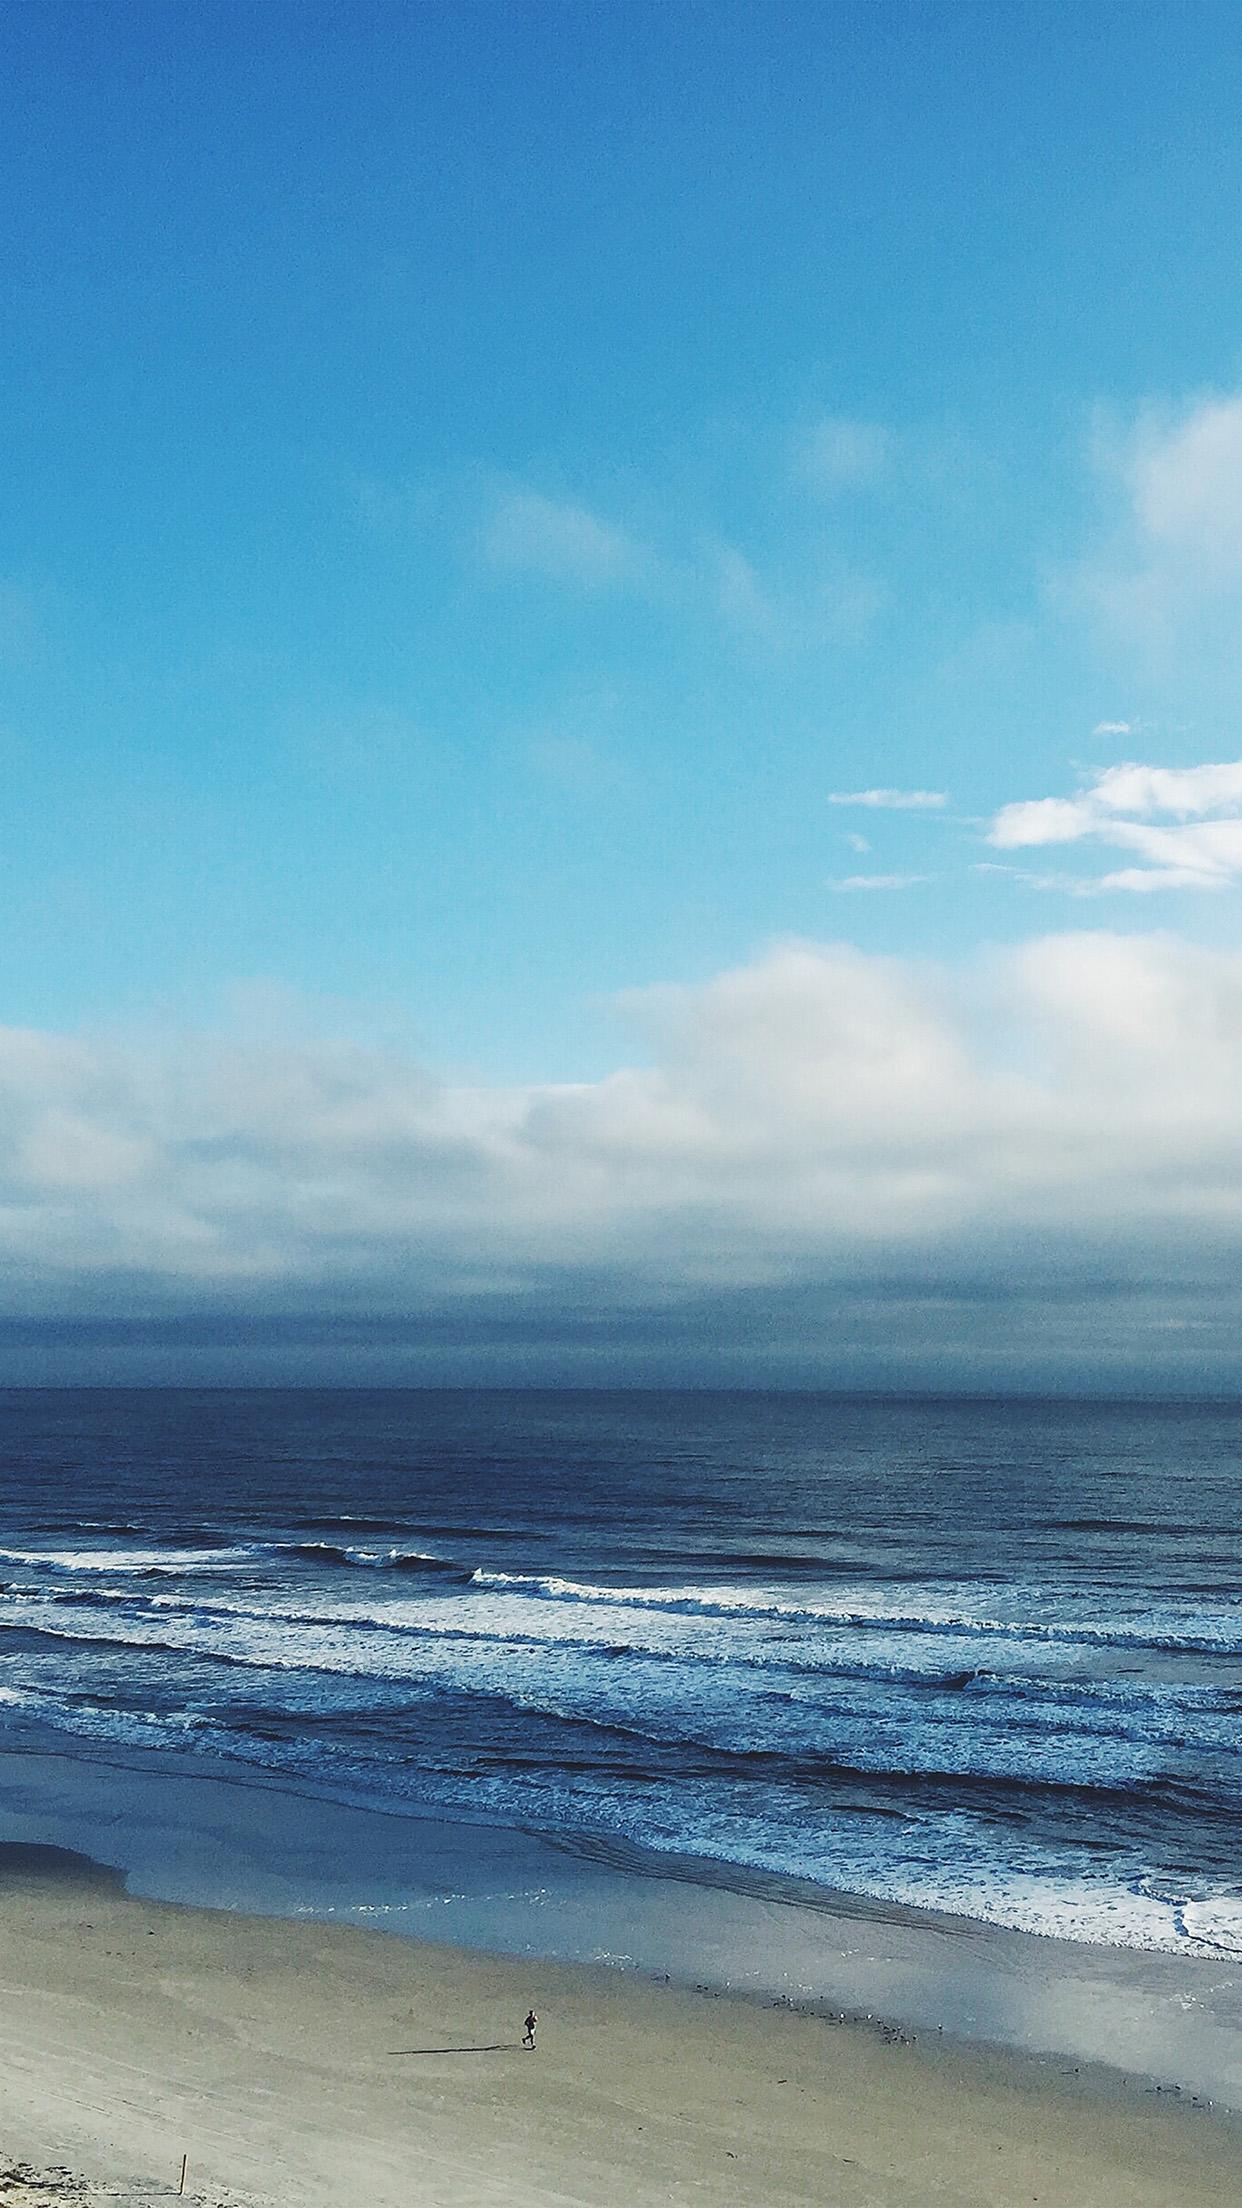 Iphone 6s Wallpaper Fall Papers Co Iphone Wallpaper Mz26 Ocean Blue Sky Cloud